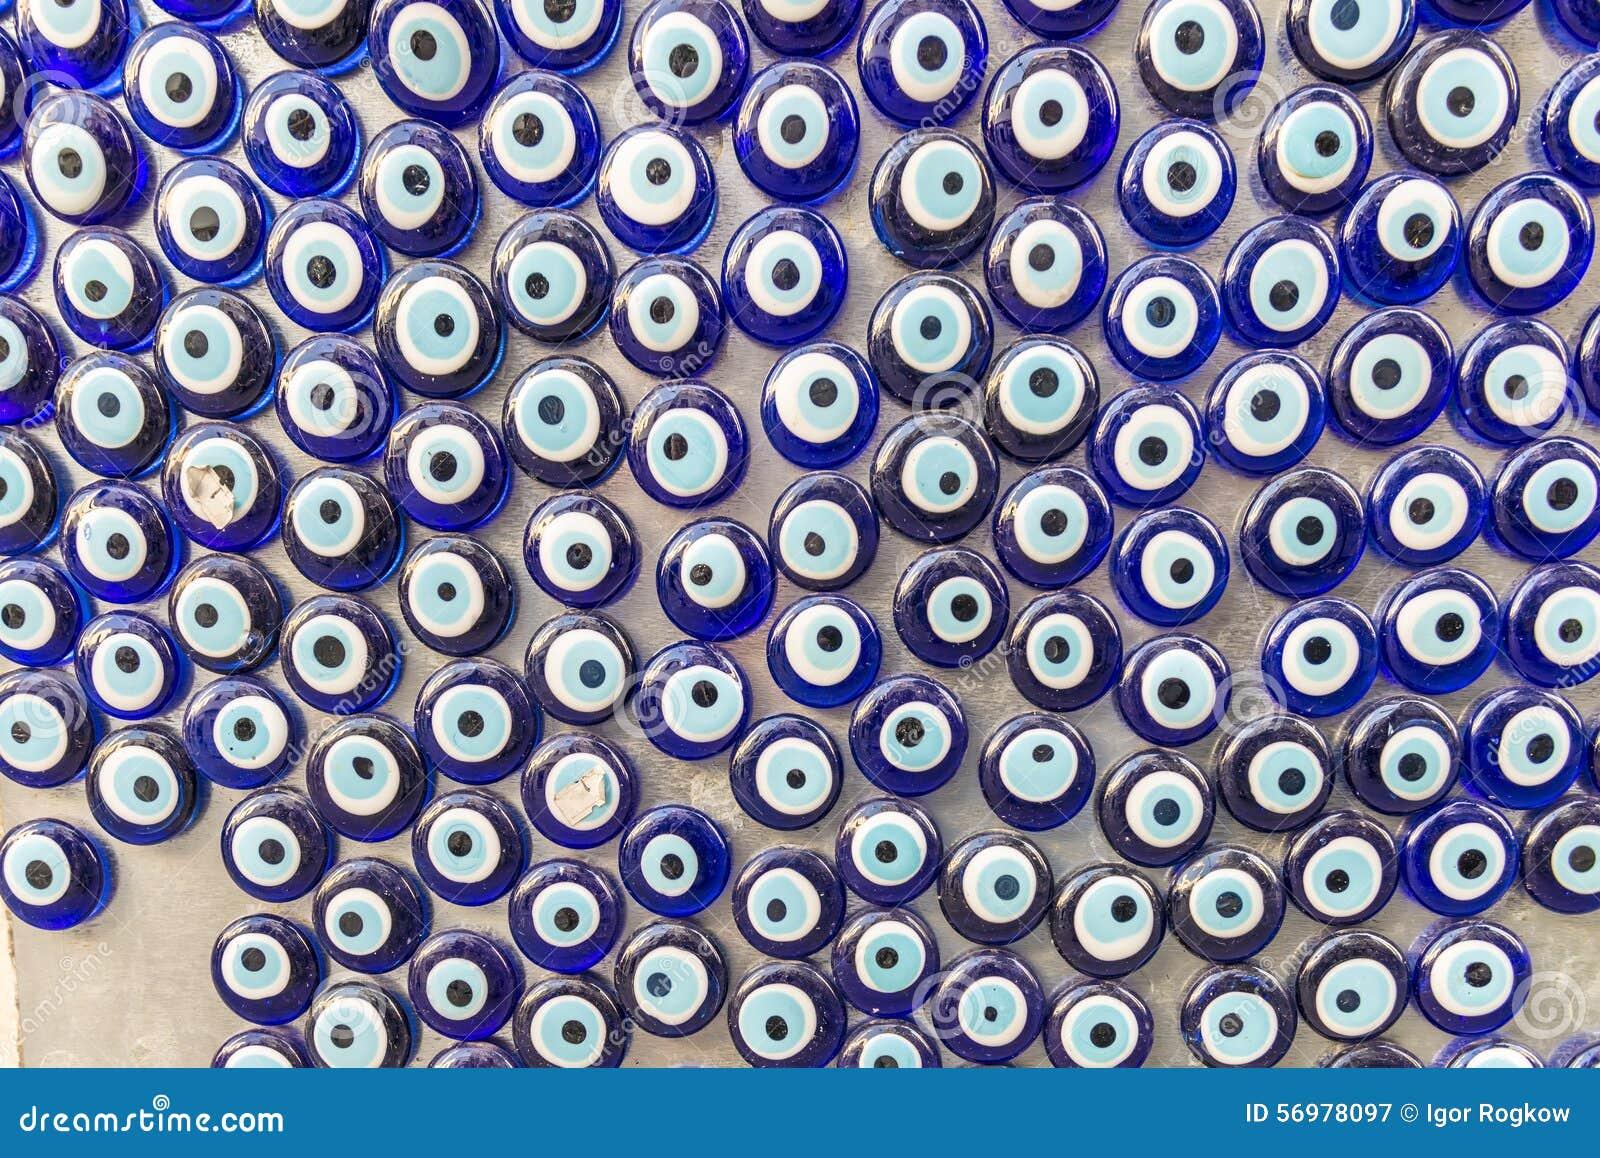 Turkish Home Decor Turkish Amulet Souvenir Glass Eye Nazar Royalty Free Stock